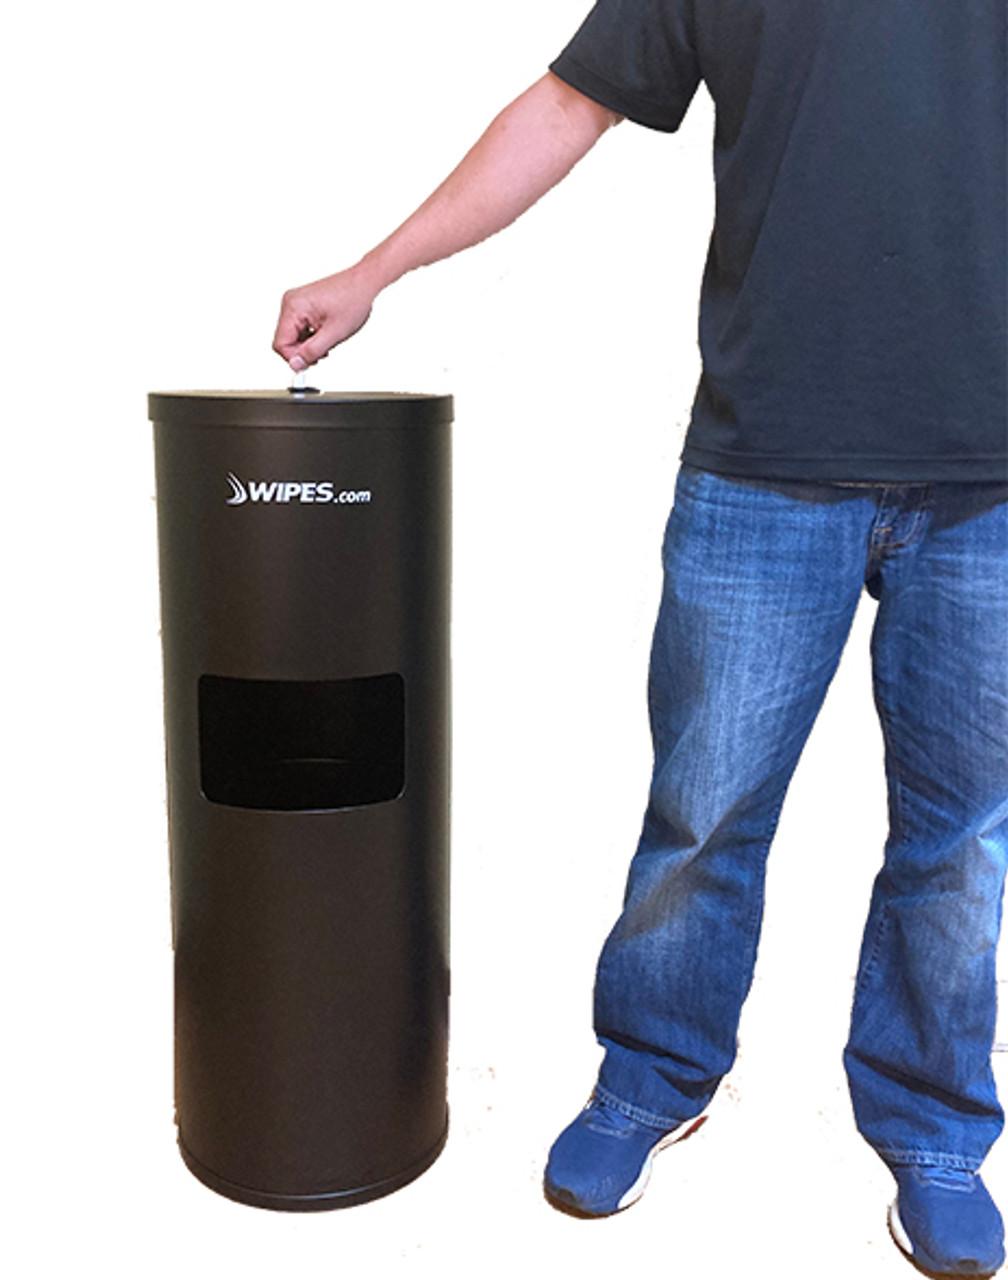 Stainless Steel Floor Stand Wipes Dispenser - Black